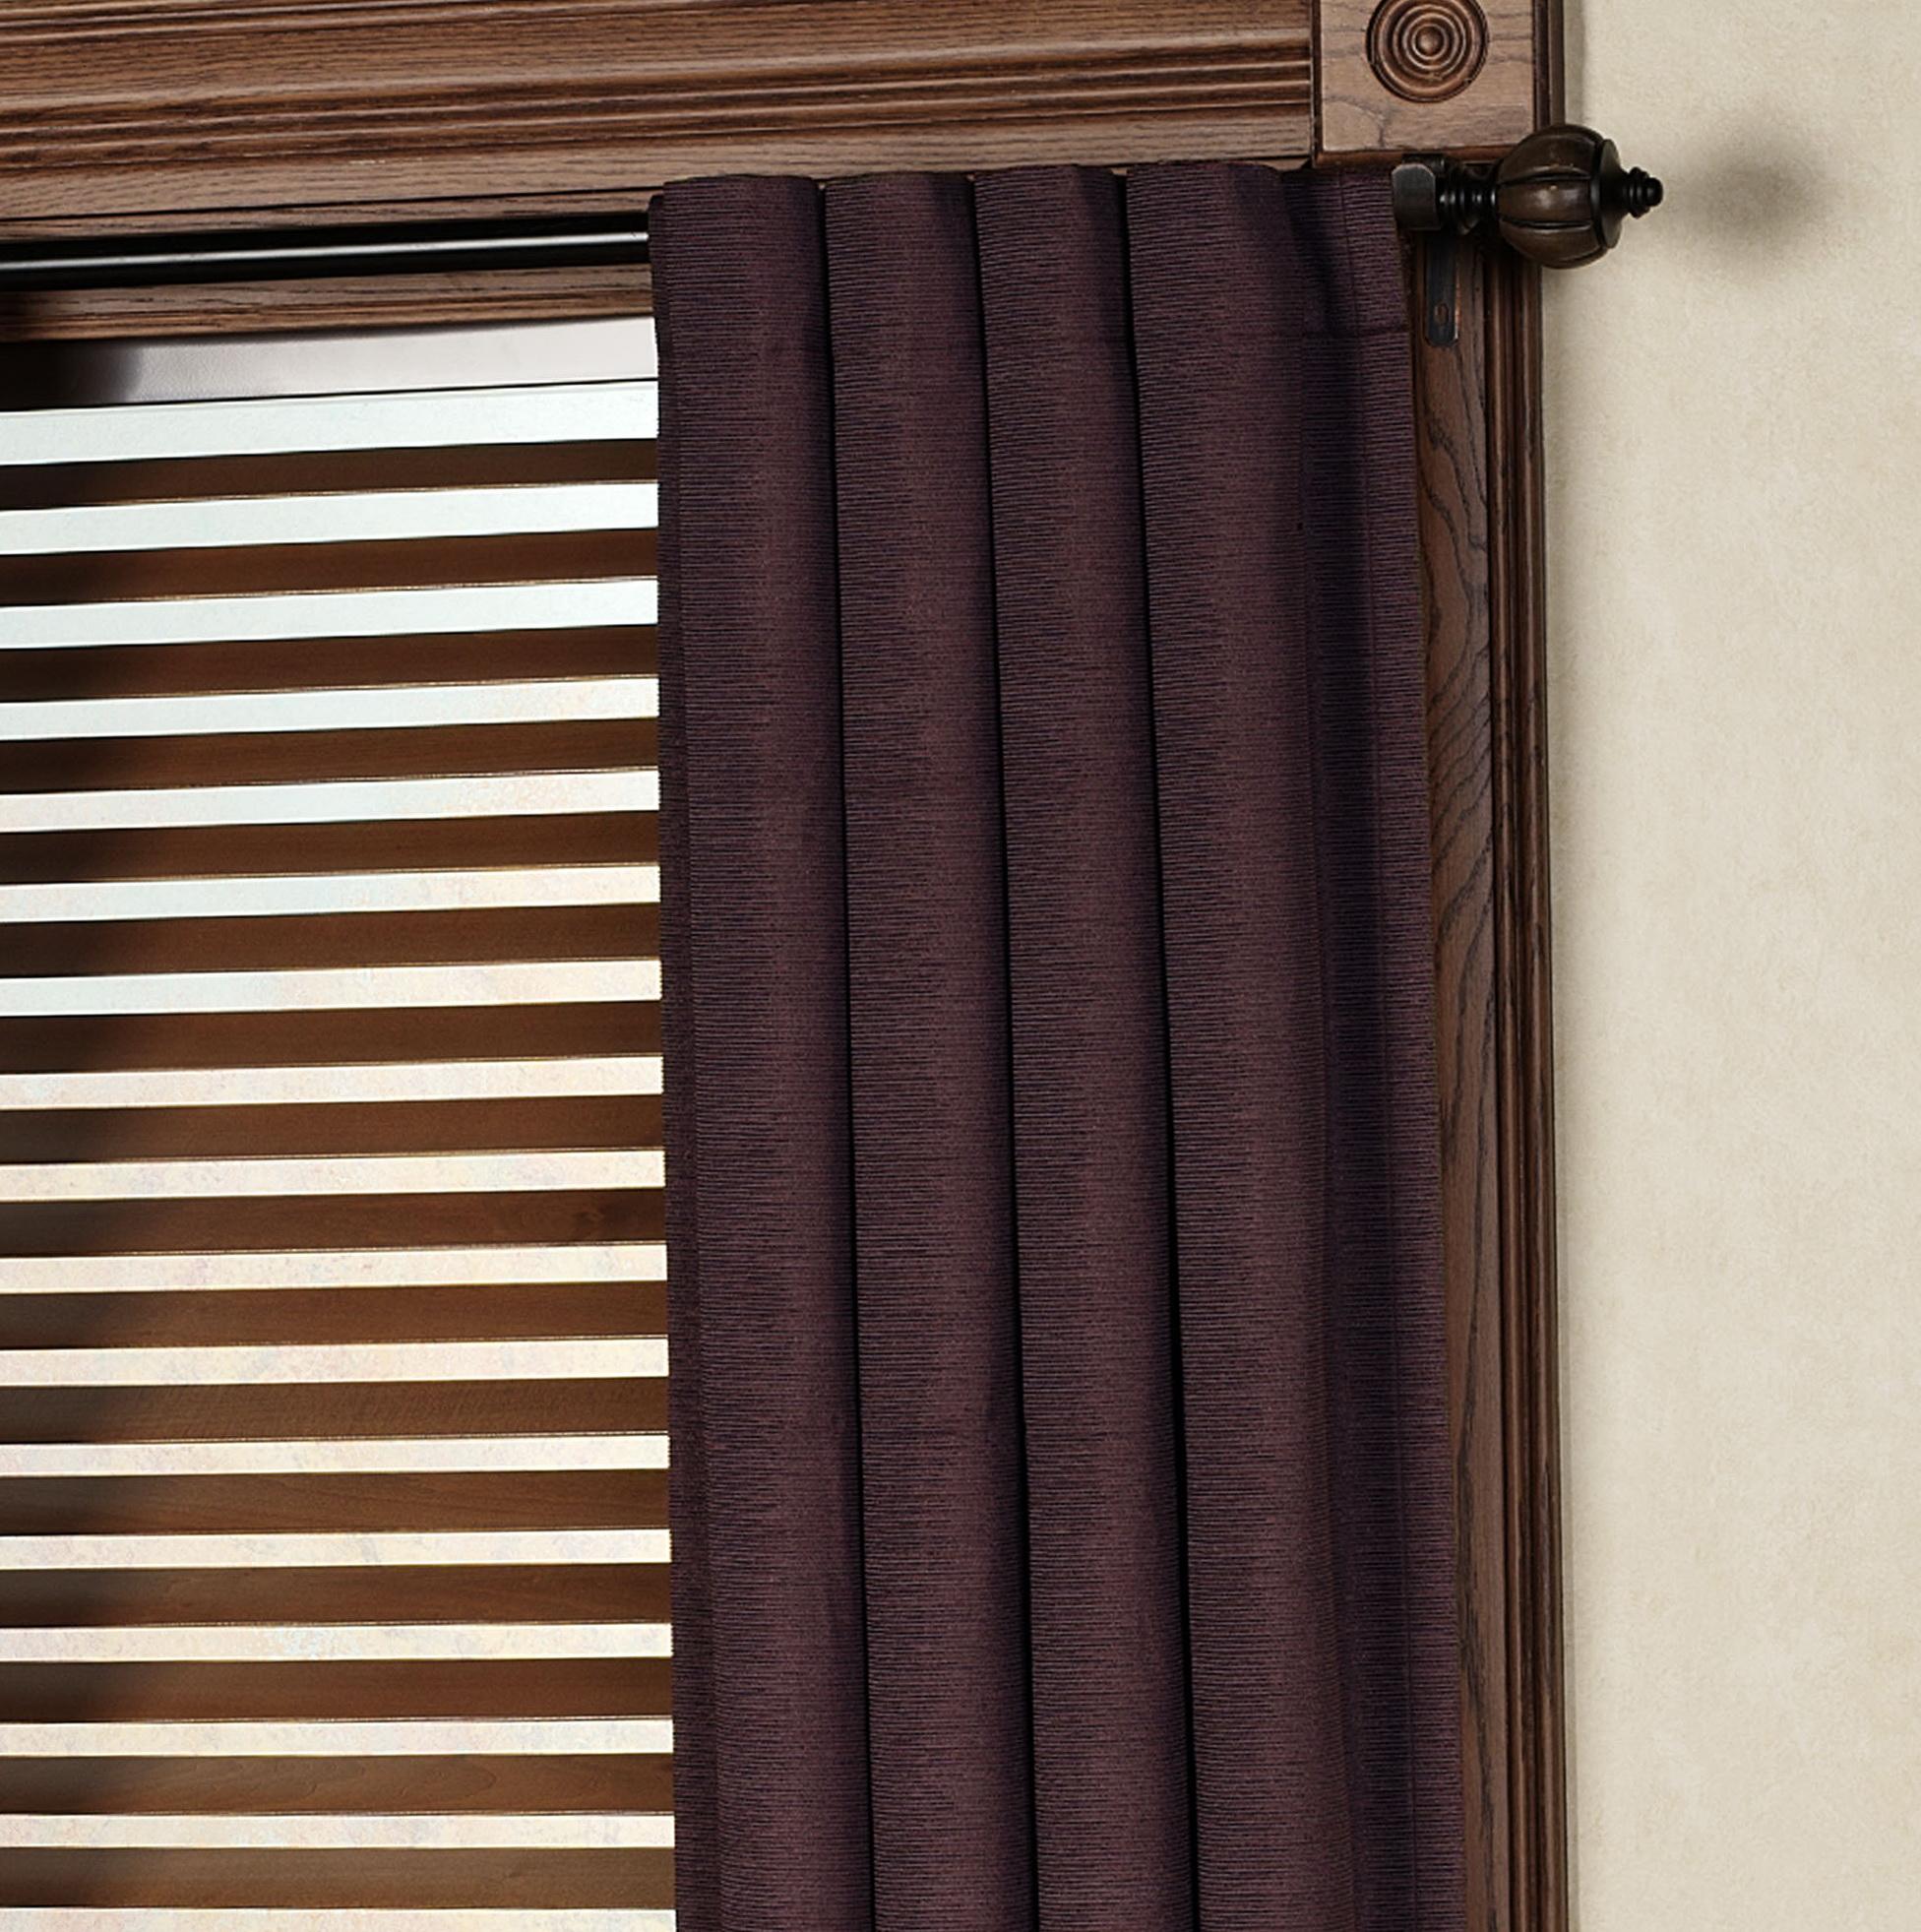 Noise Reduction Curtains Reviews Home Design Ideas